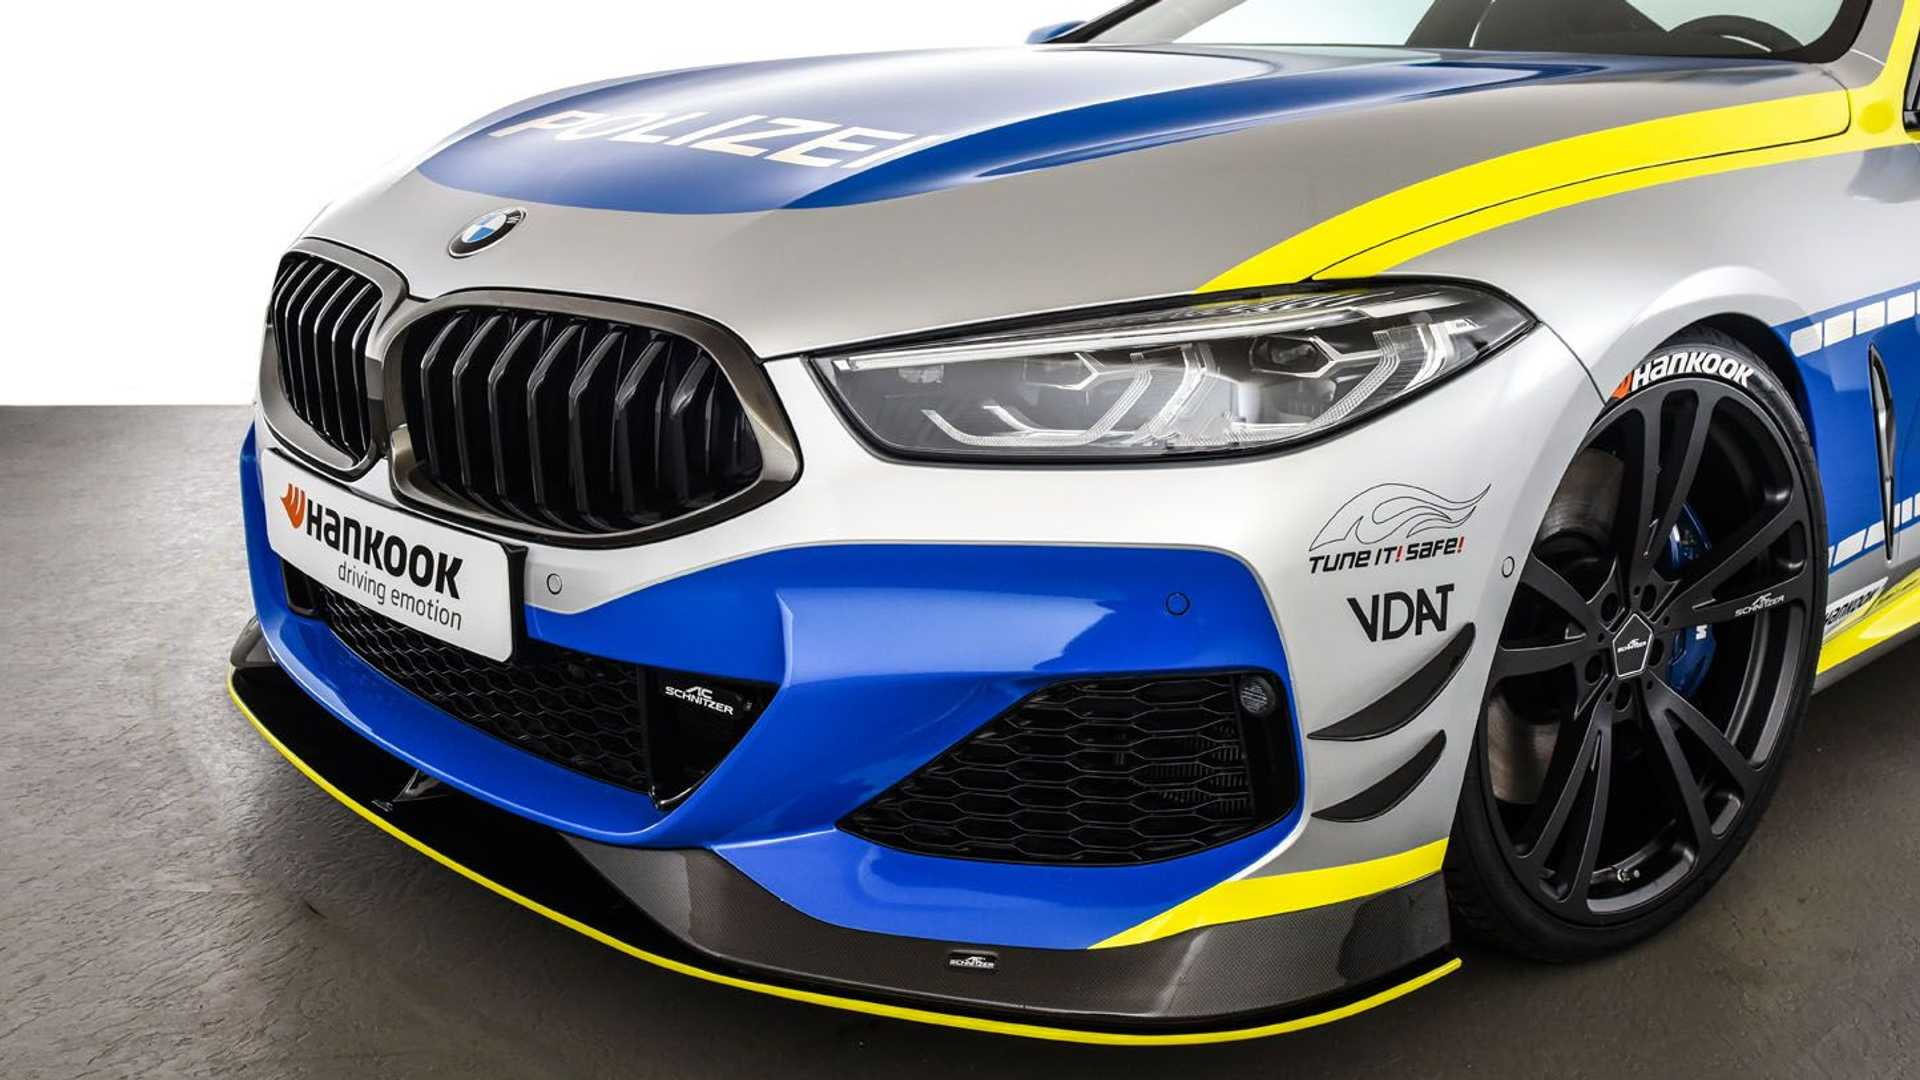 BMW-M850i-police-car-tune-it-safe-33